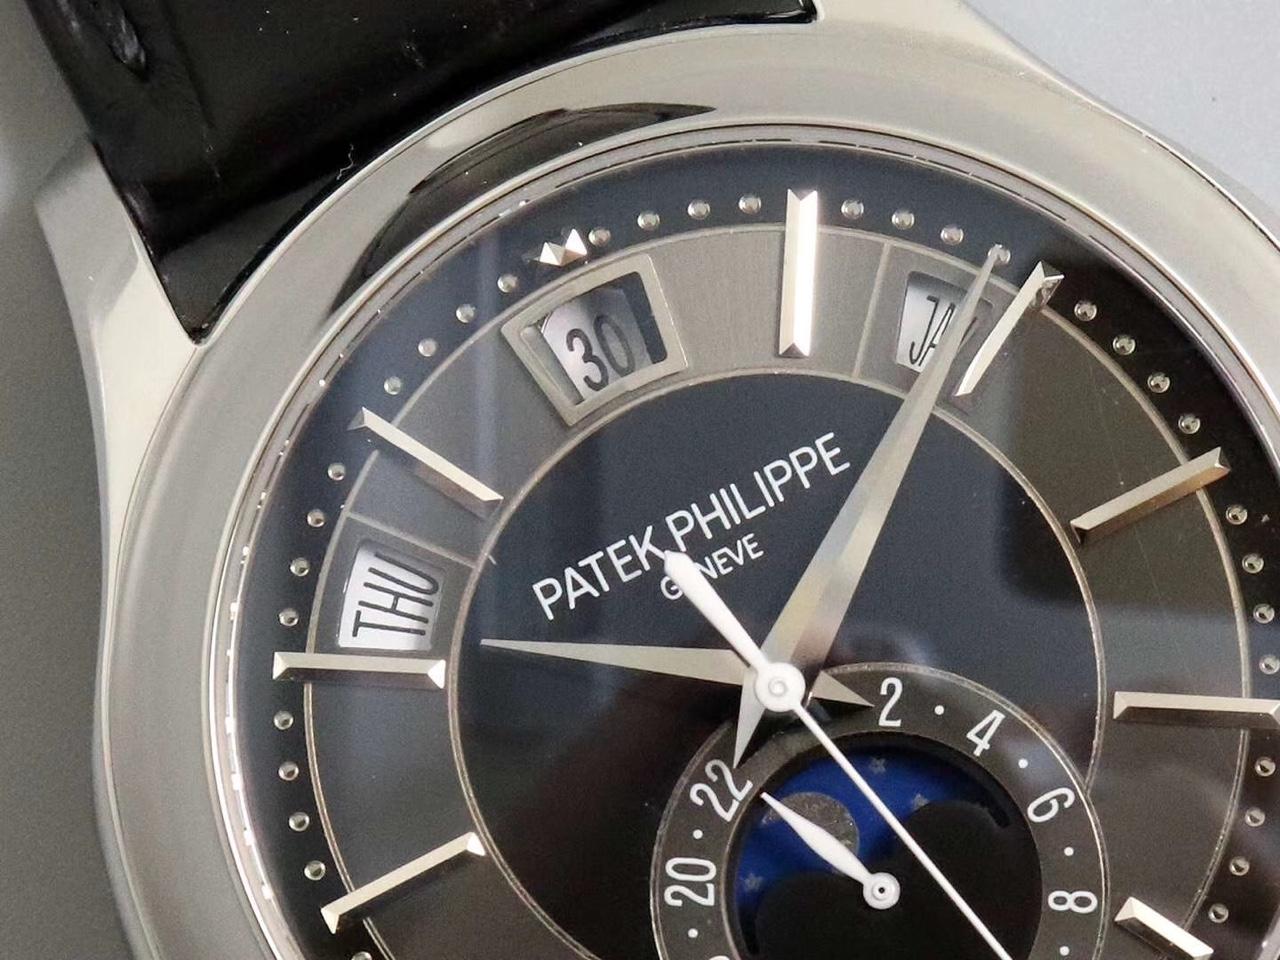 bán đồng hồ patek philippe super fake